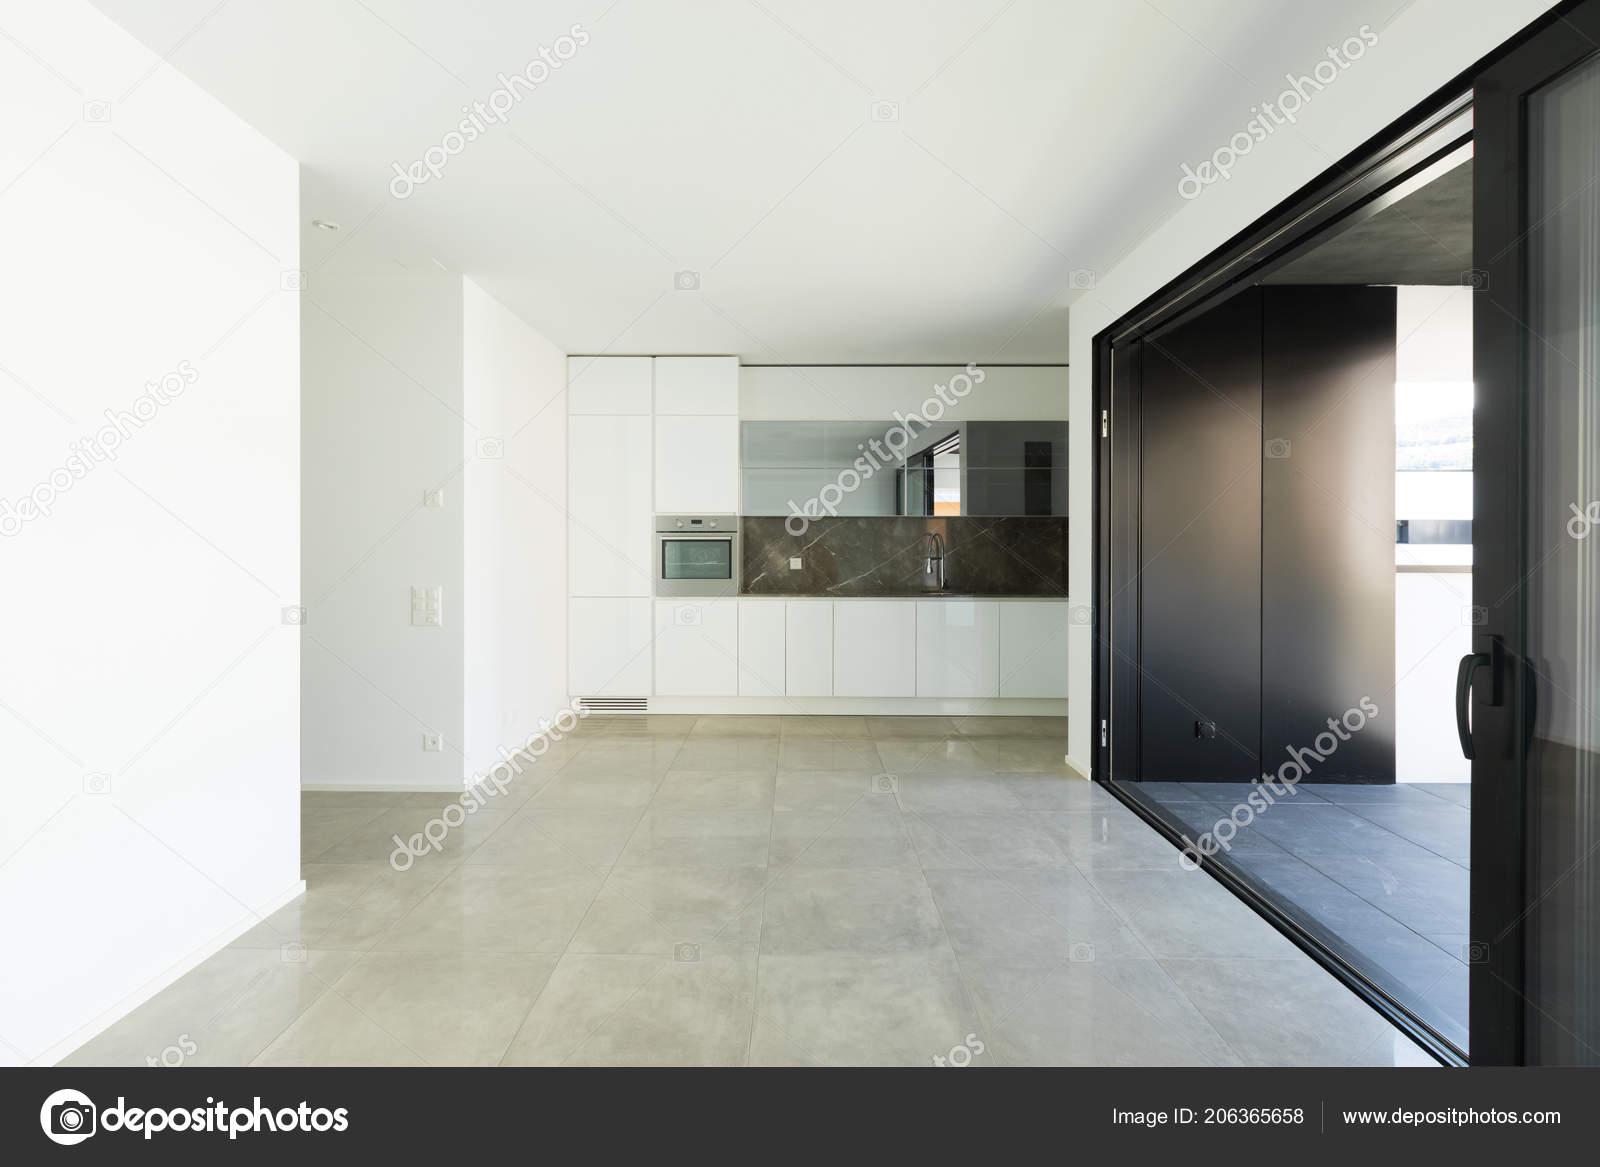 Interior modern apartment nobody white walls u stockfoto zveiger